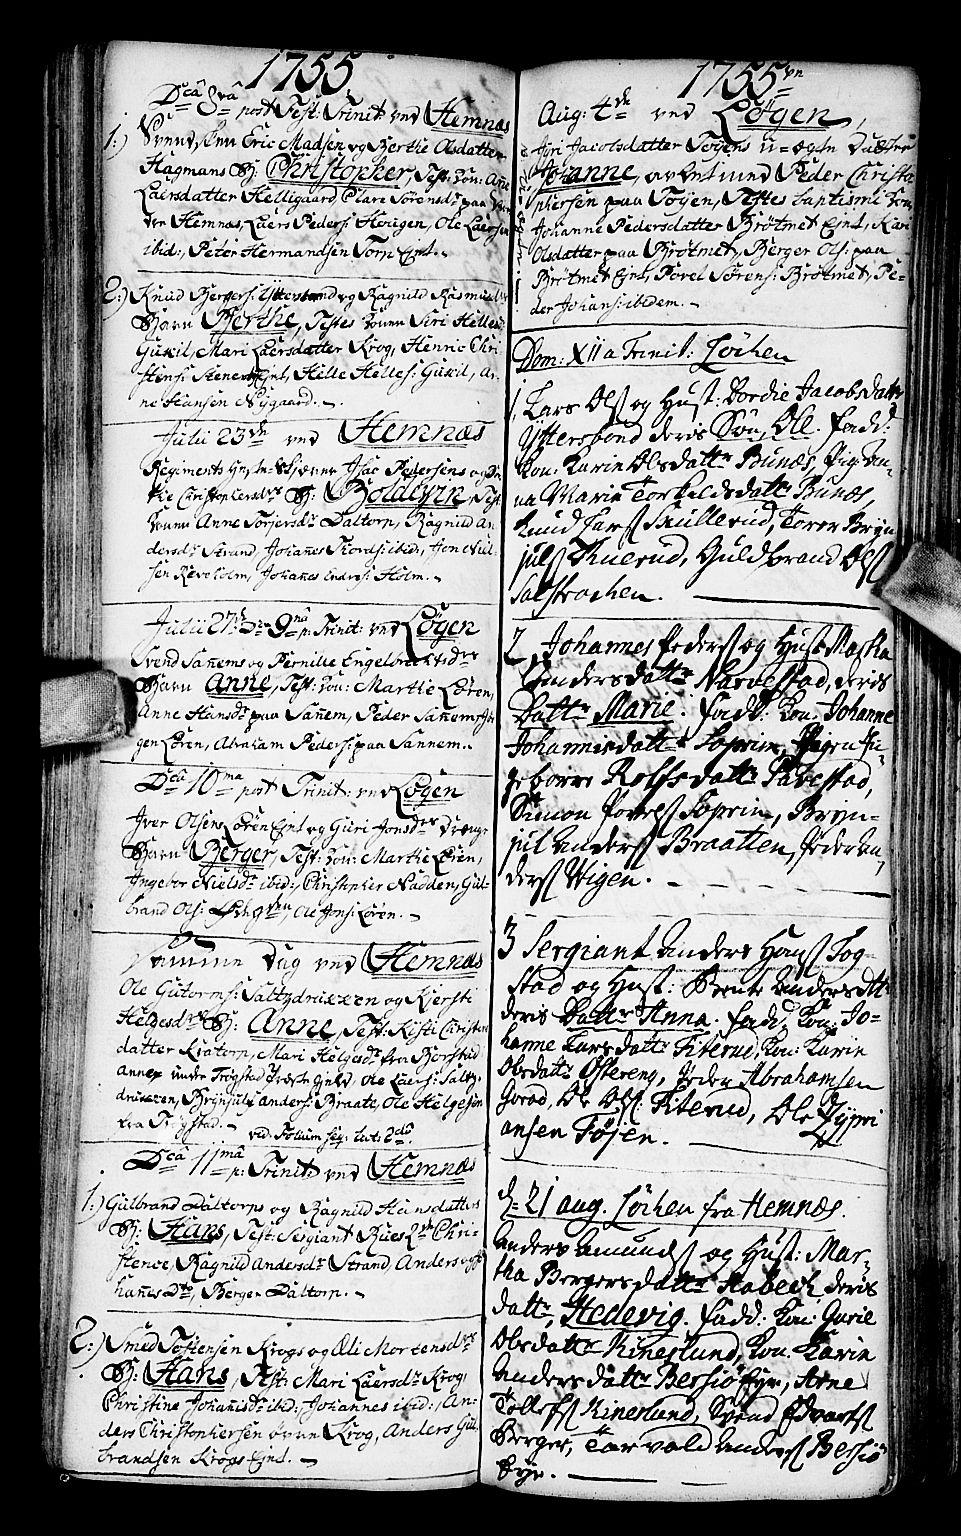 SAO, Høland prestekontor Kirkebøker, F/Fa/L0003: Ministerialbok nr. I 3, 1739-1756